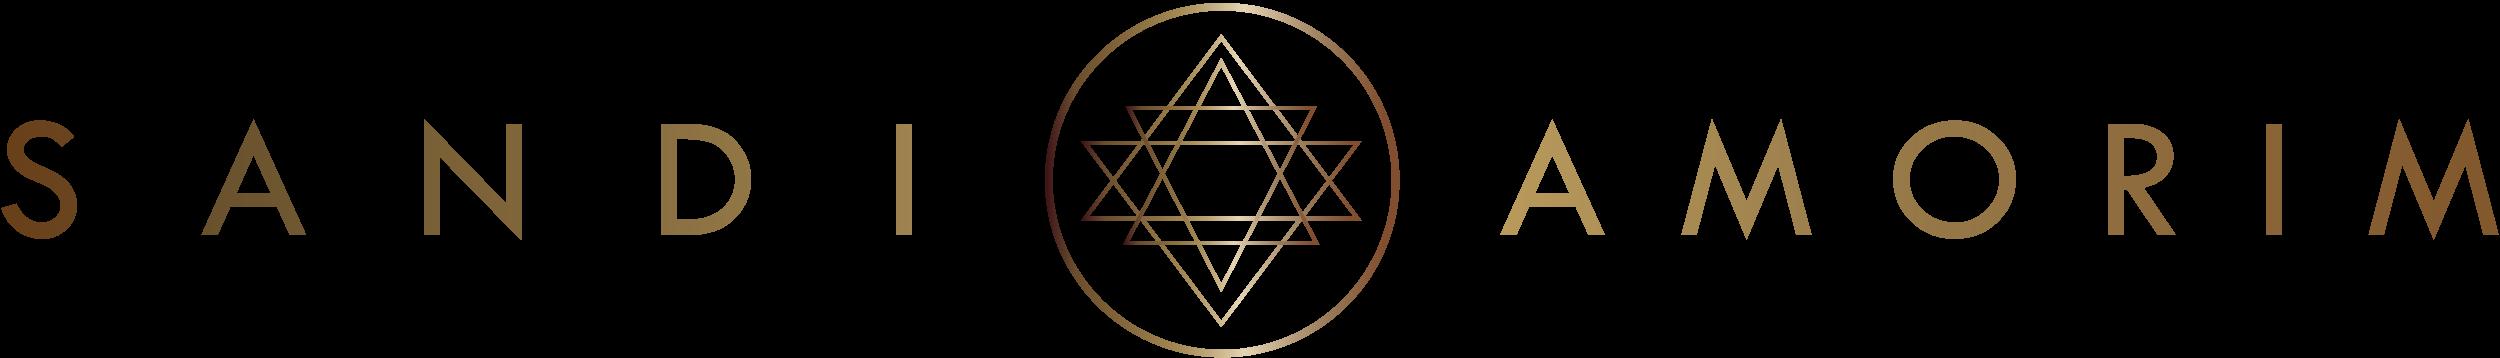 Sandi-Amorim-Logo-Horizontal-Centered